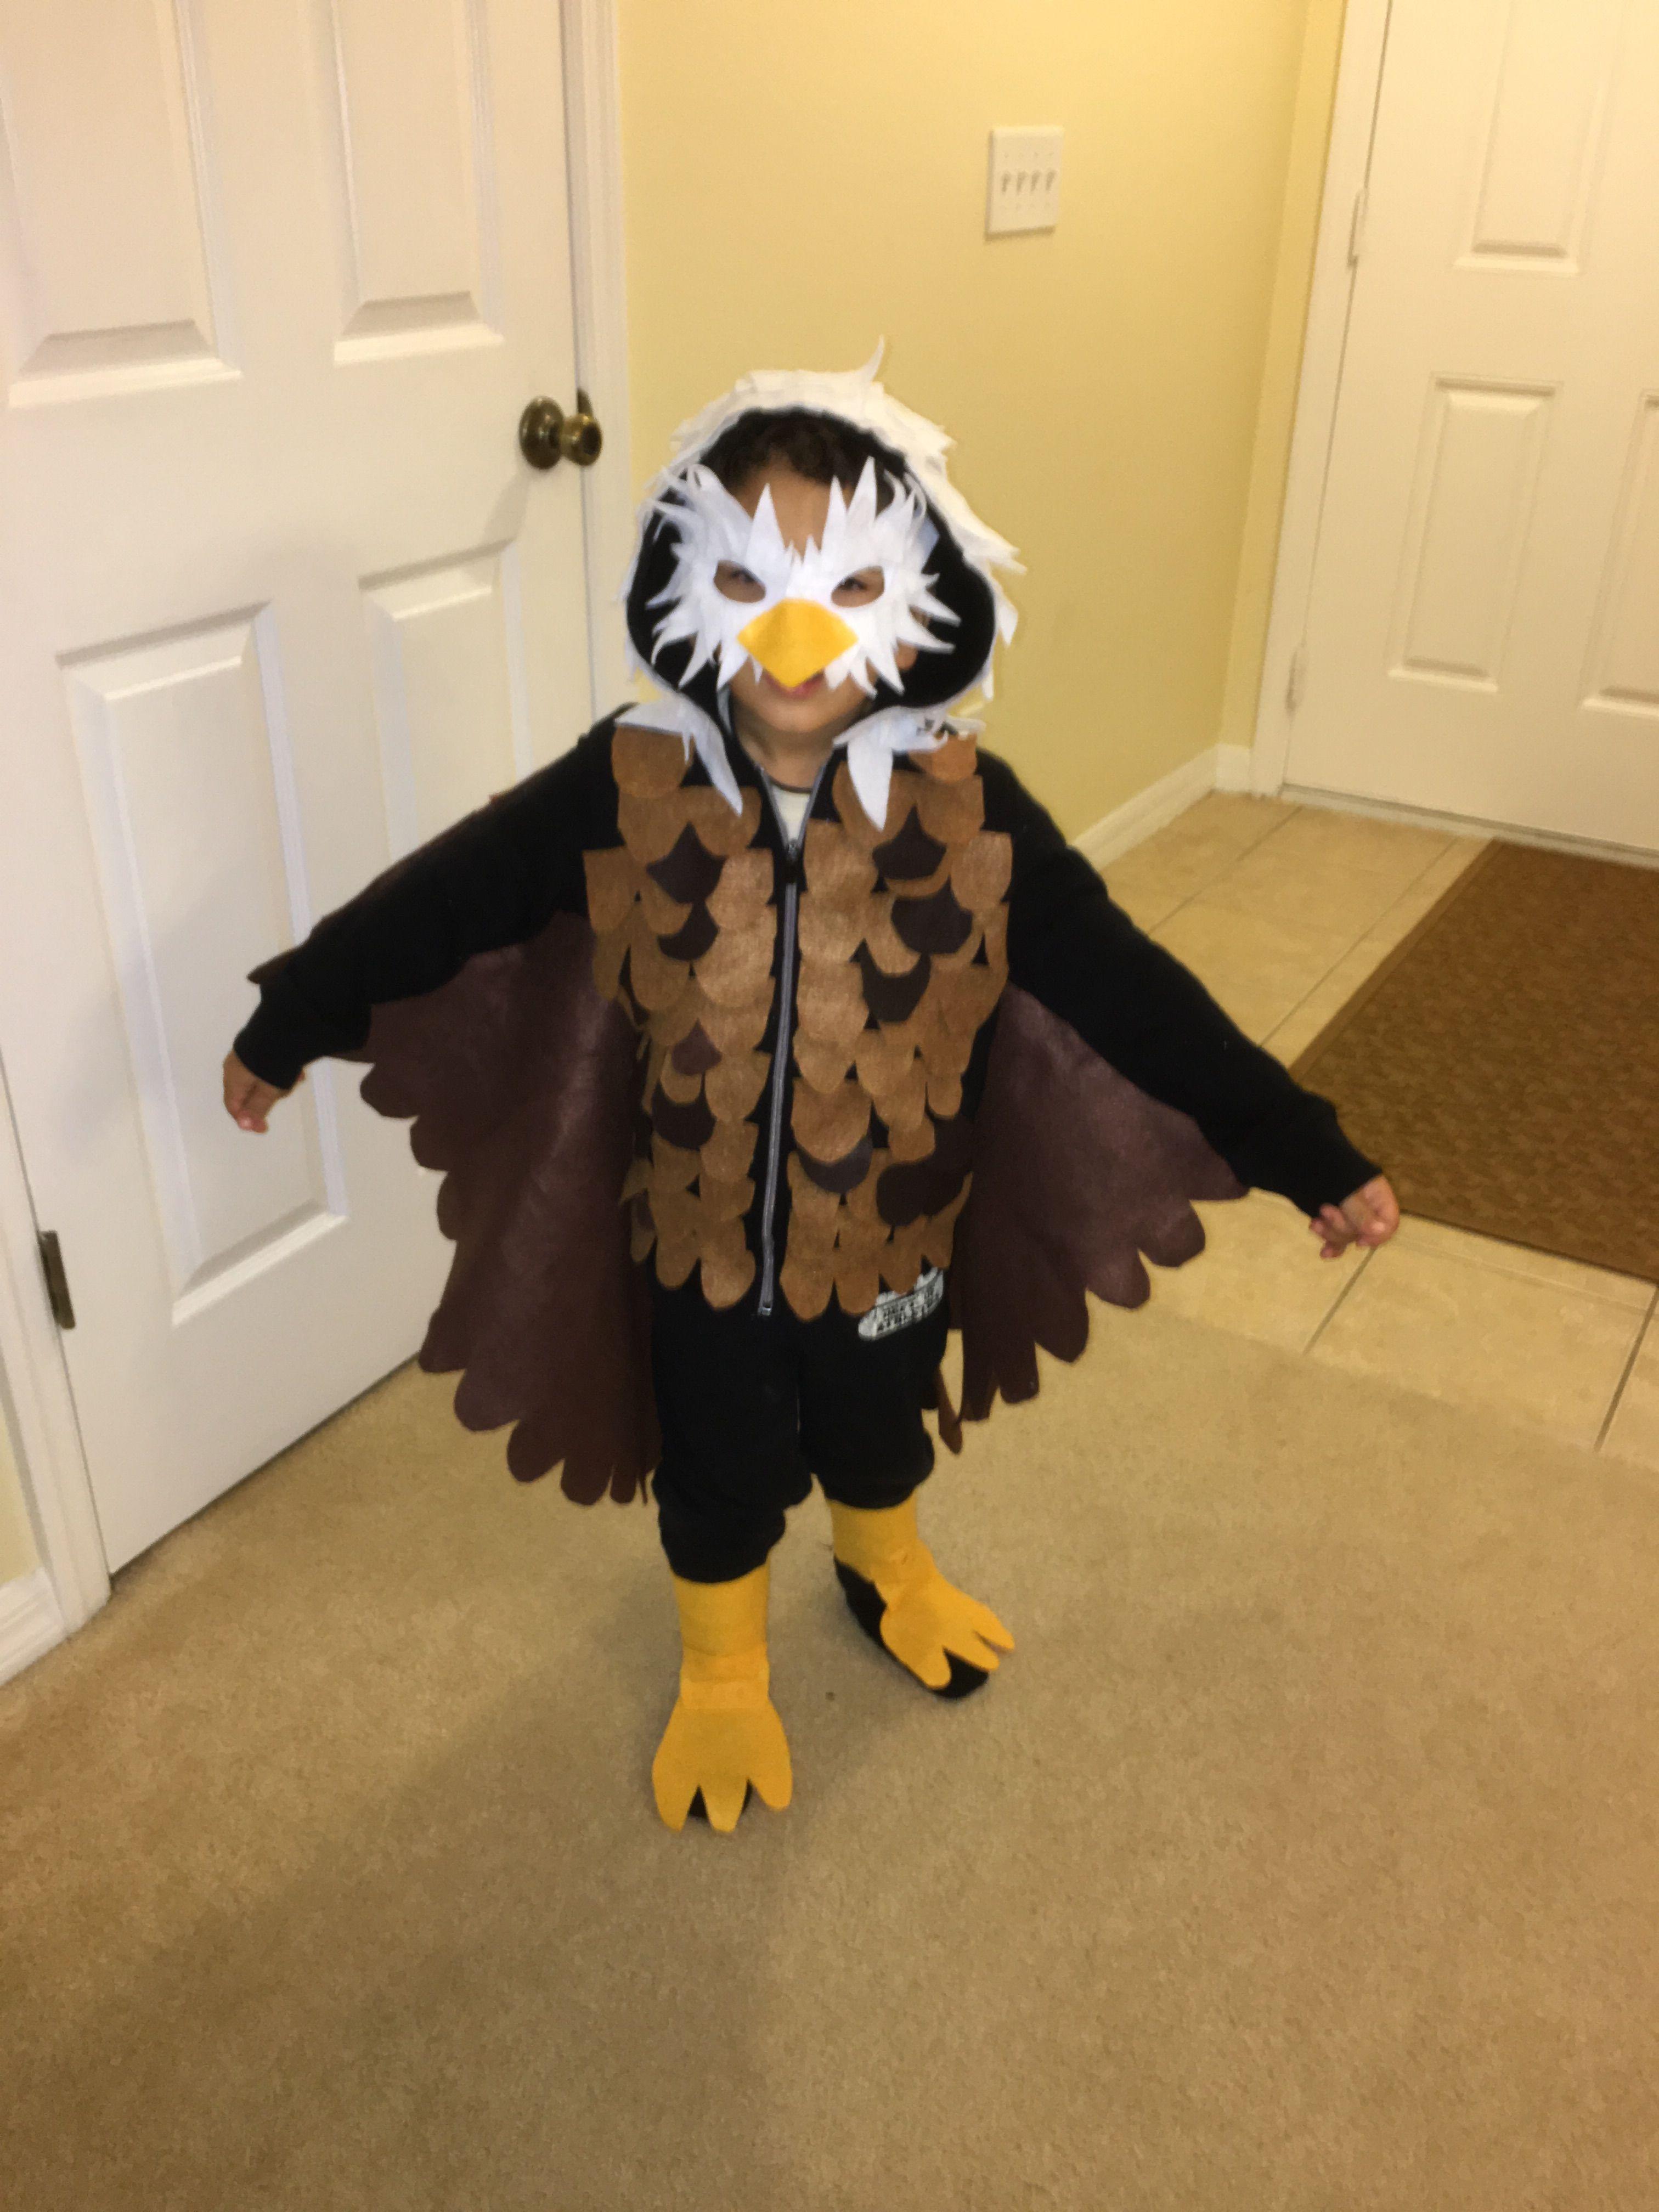 Bald Eagle Costume 5t Children Sweater Cape And Mask Top Halloween Costumes Bff Halloween Costumes Bird Costume